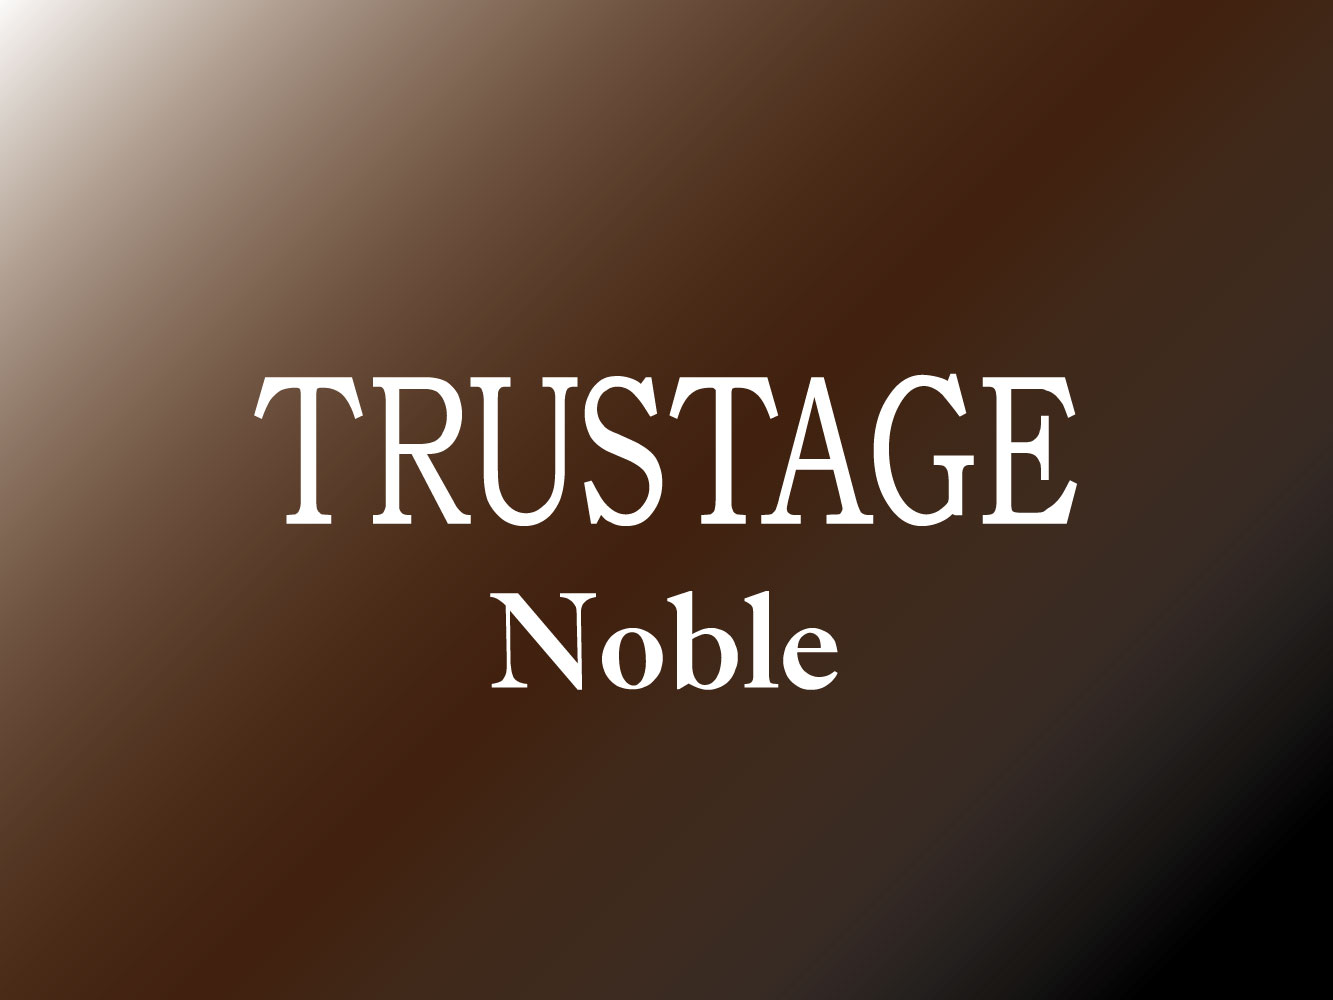 TRUSTAGE (トラステージ)